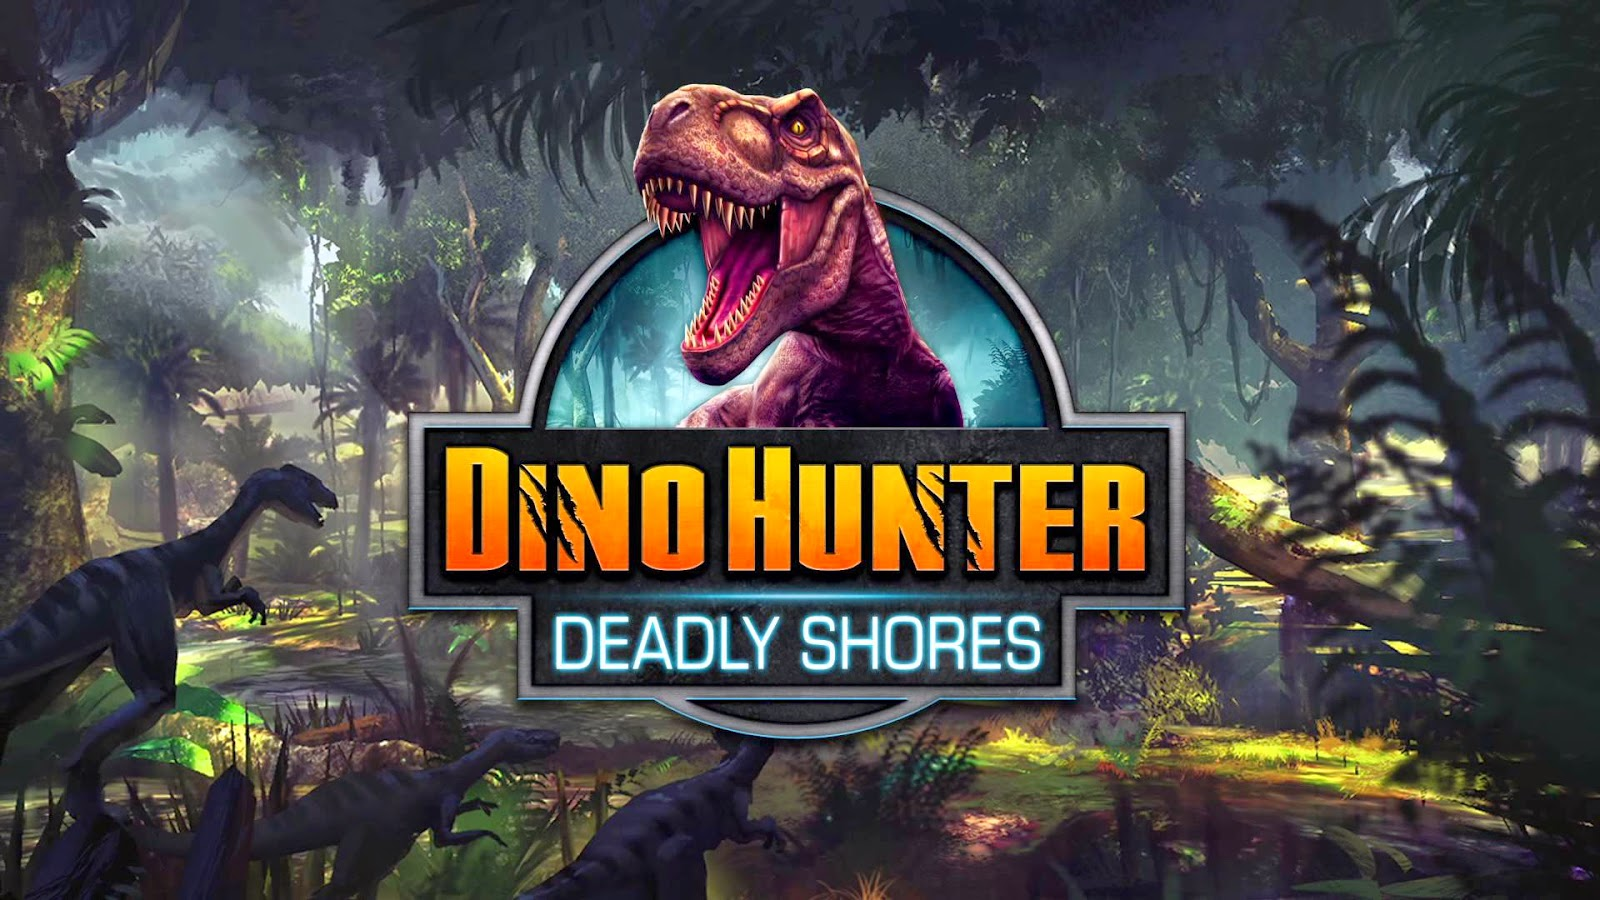 Dino Hunter: Deadly Shores 1.0.0 Apk Download